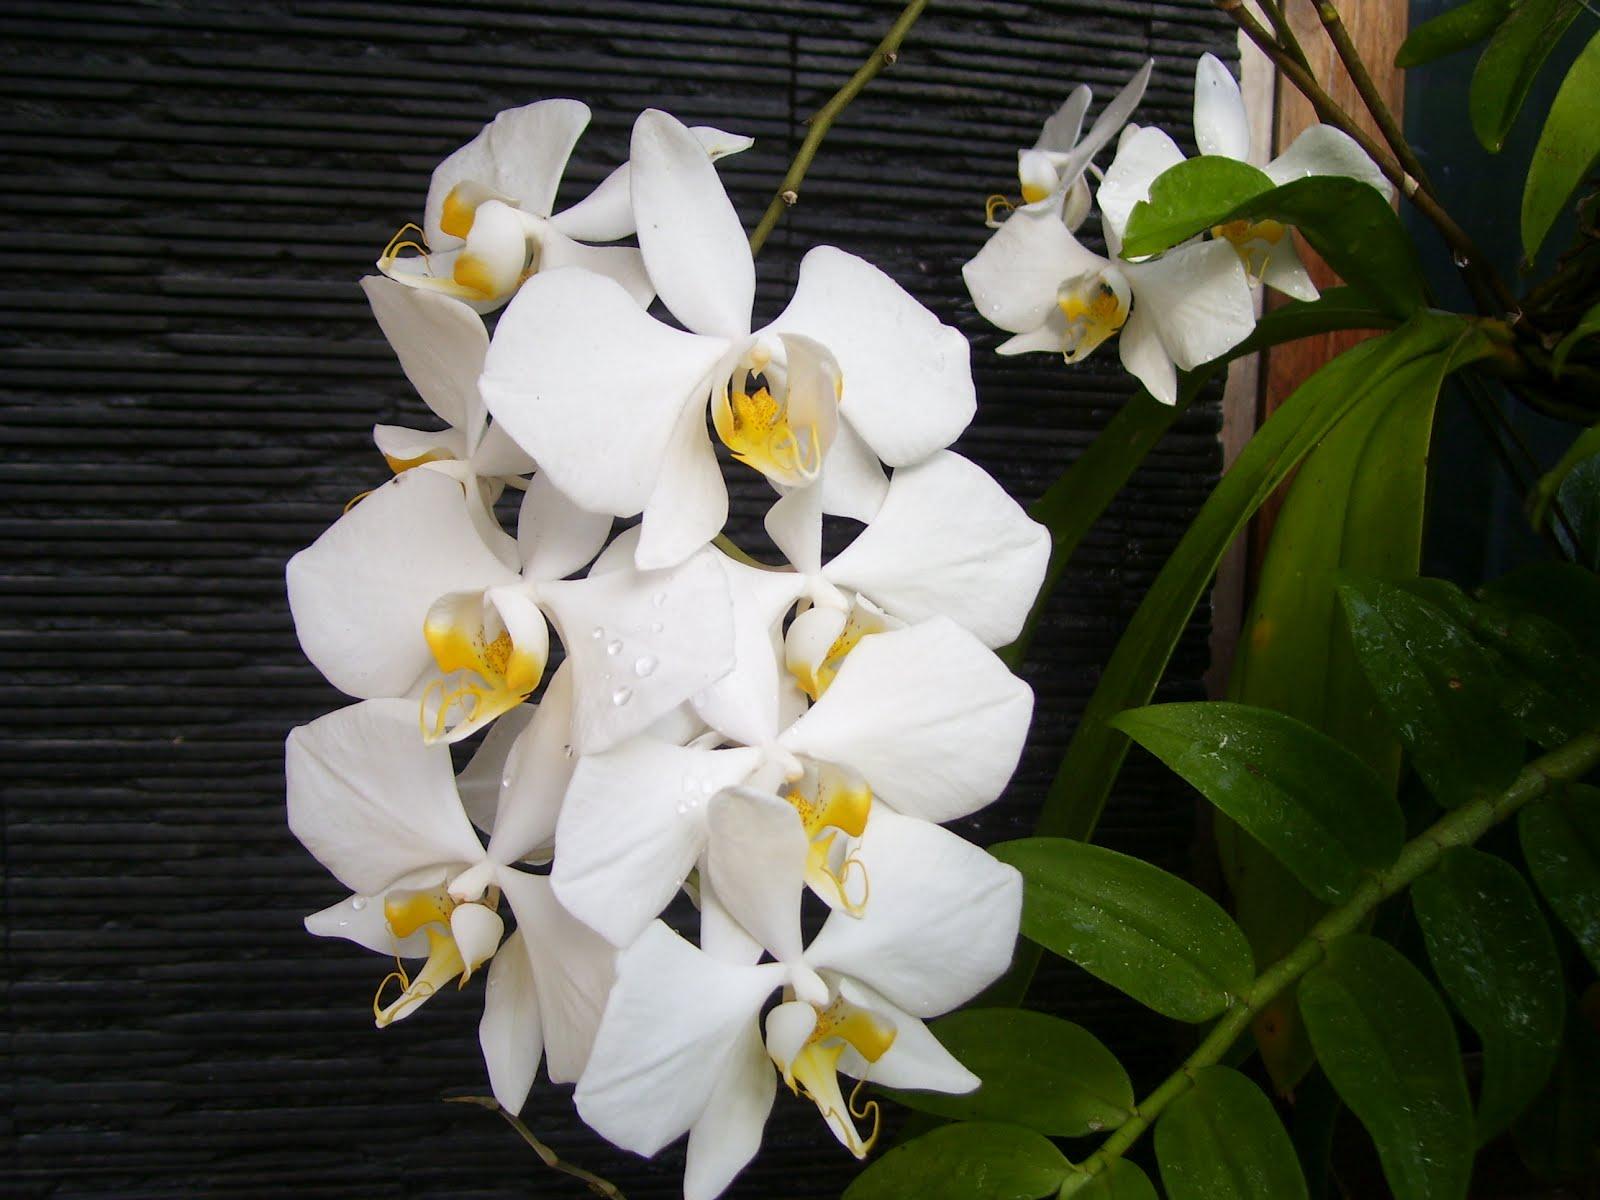 Anggrek Bulan godean.web.id